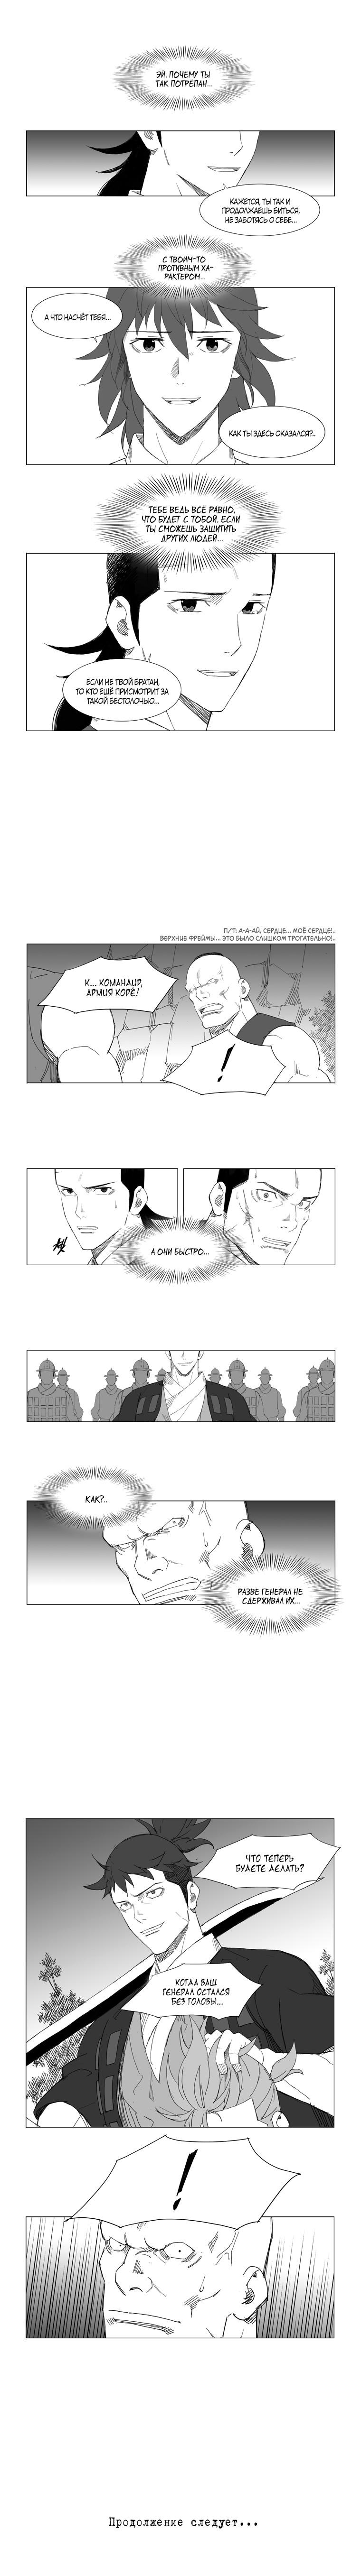 https://r1.ninemanga.com/comics/pic2/39/28263/331326/1502309156648.jpg Page 6